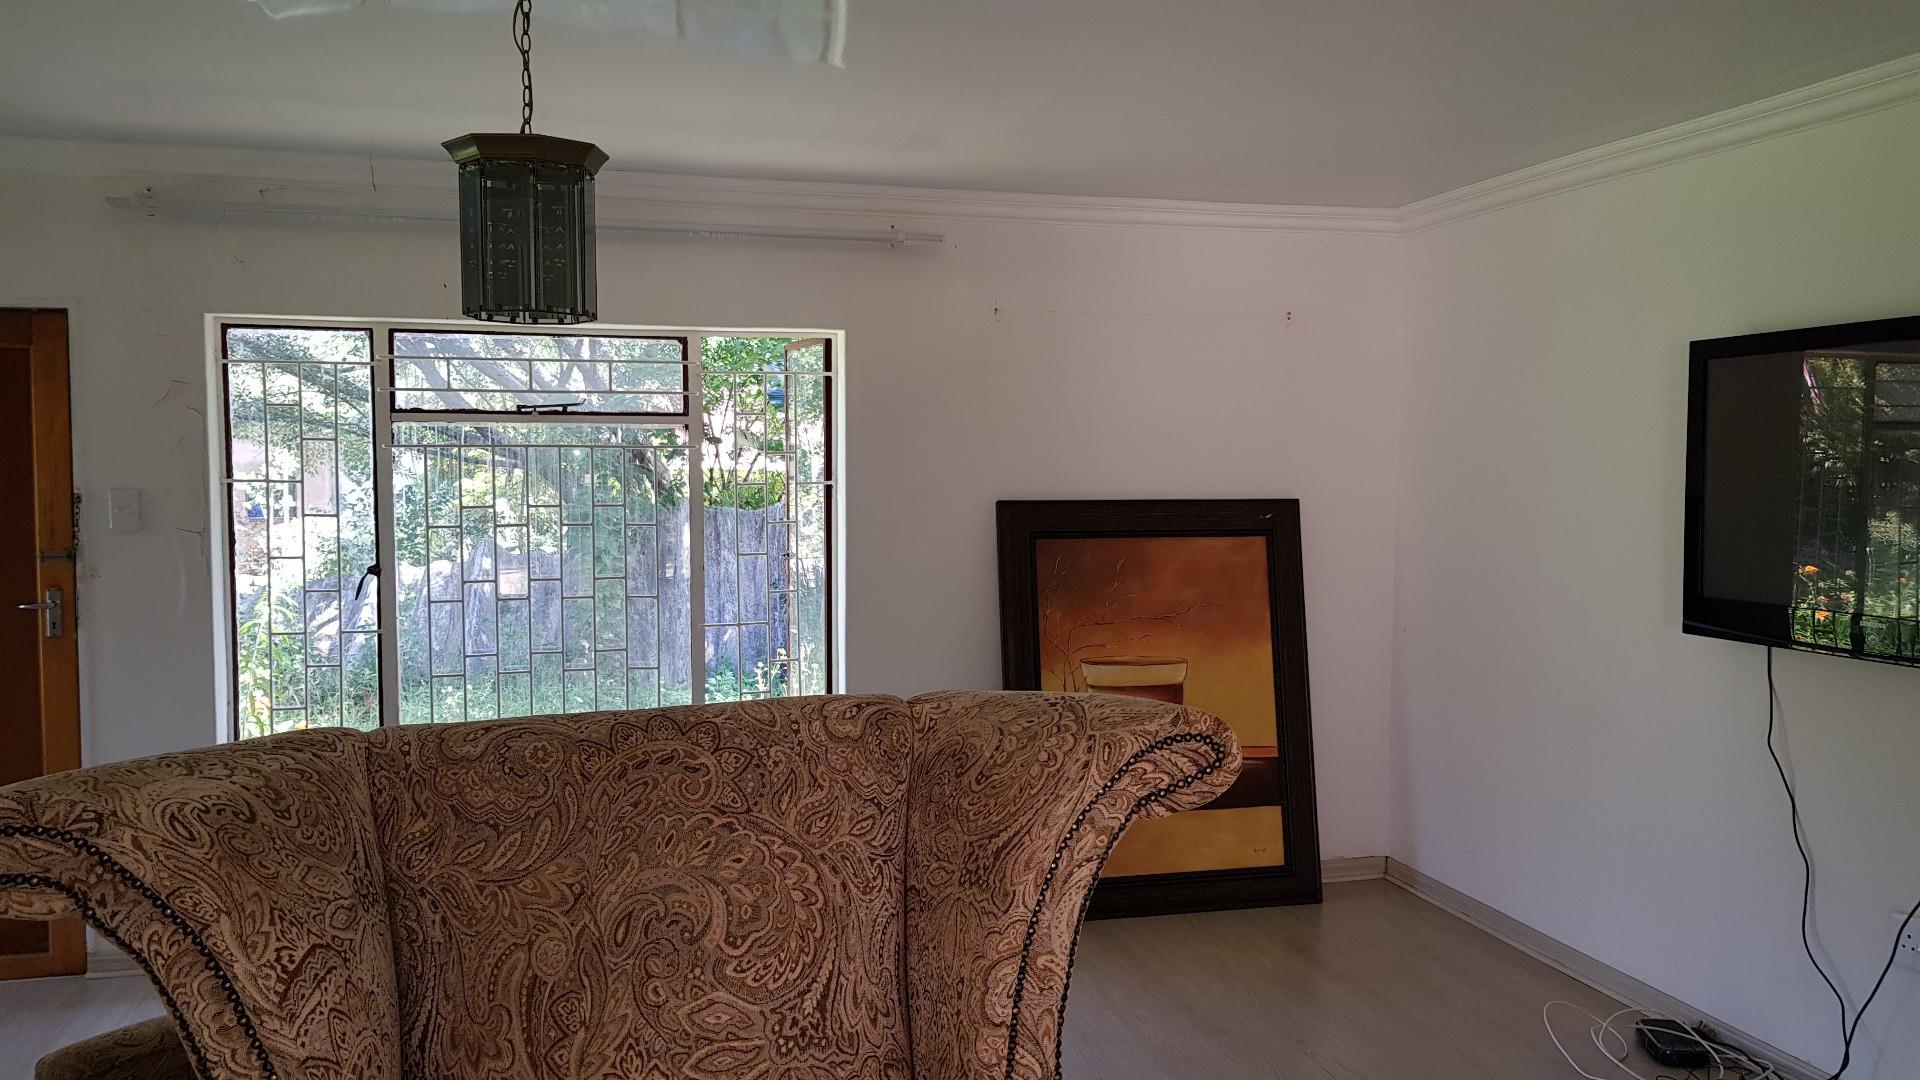 5 Bedroom House For Sale in Louis Trichardt